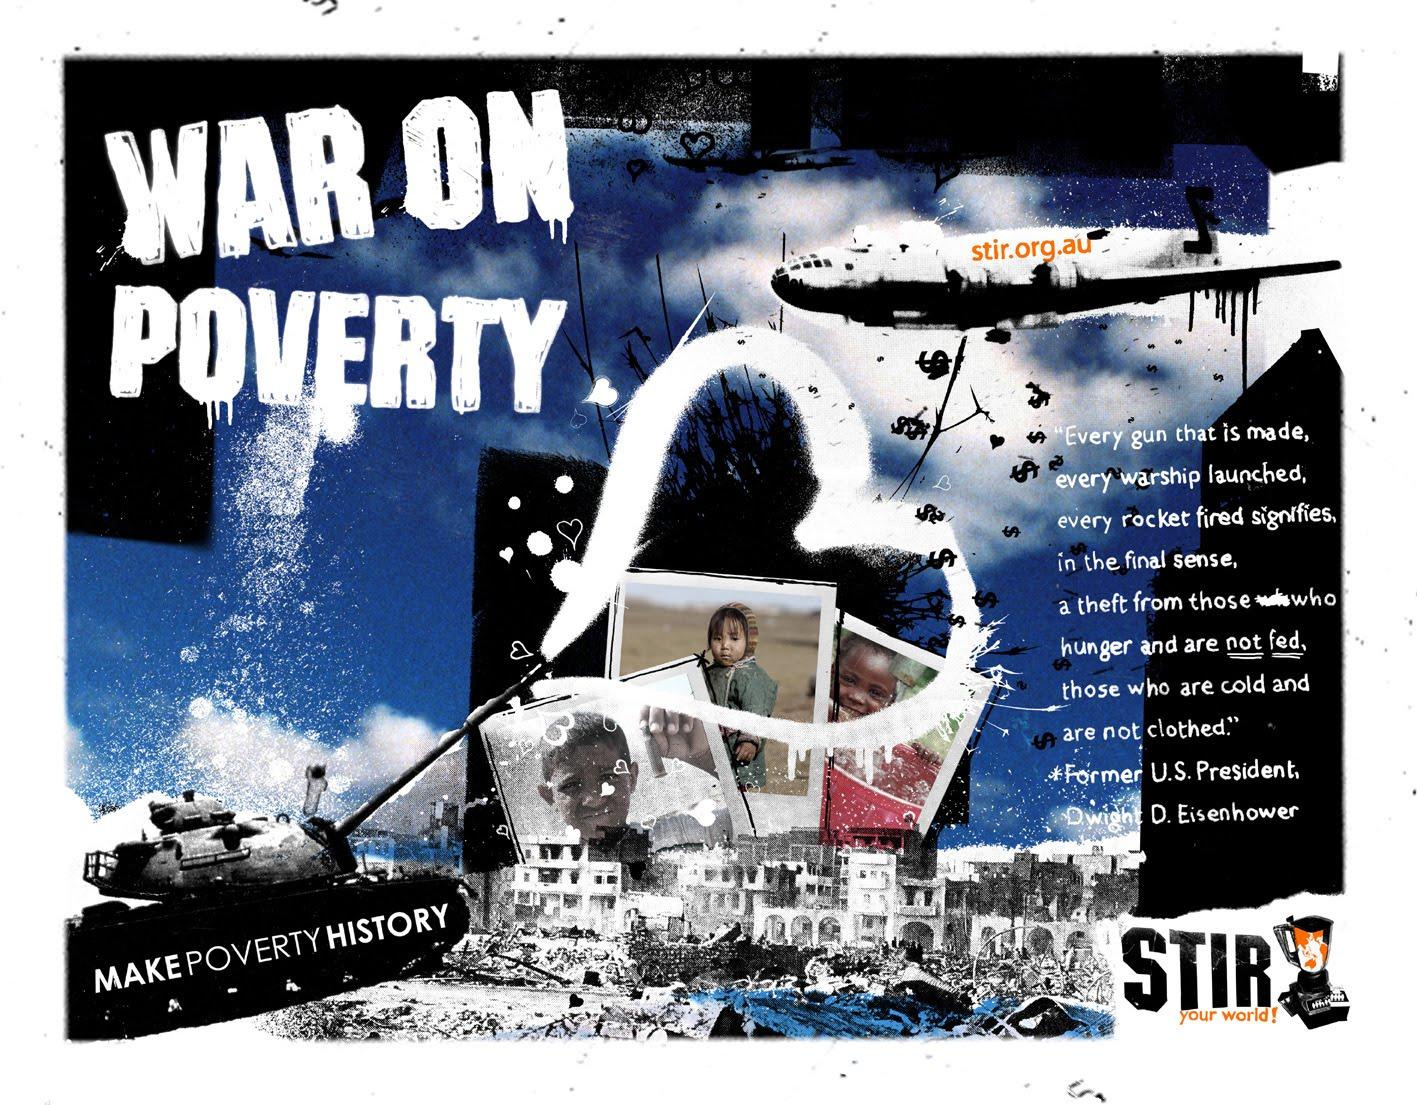 http://2.bp.blogspot.com/_rDJCbIPIXm4/TF48T3SqhAI/AAAAAAAAAHA/byfibhlhNsY/s1600/STIR-War-On-Poverty-Wallpaper-Poster.jpg